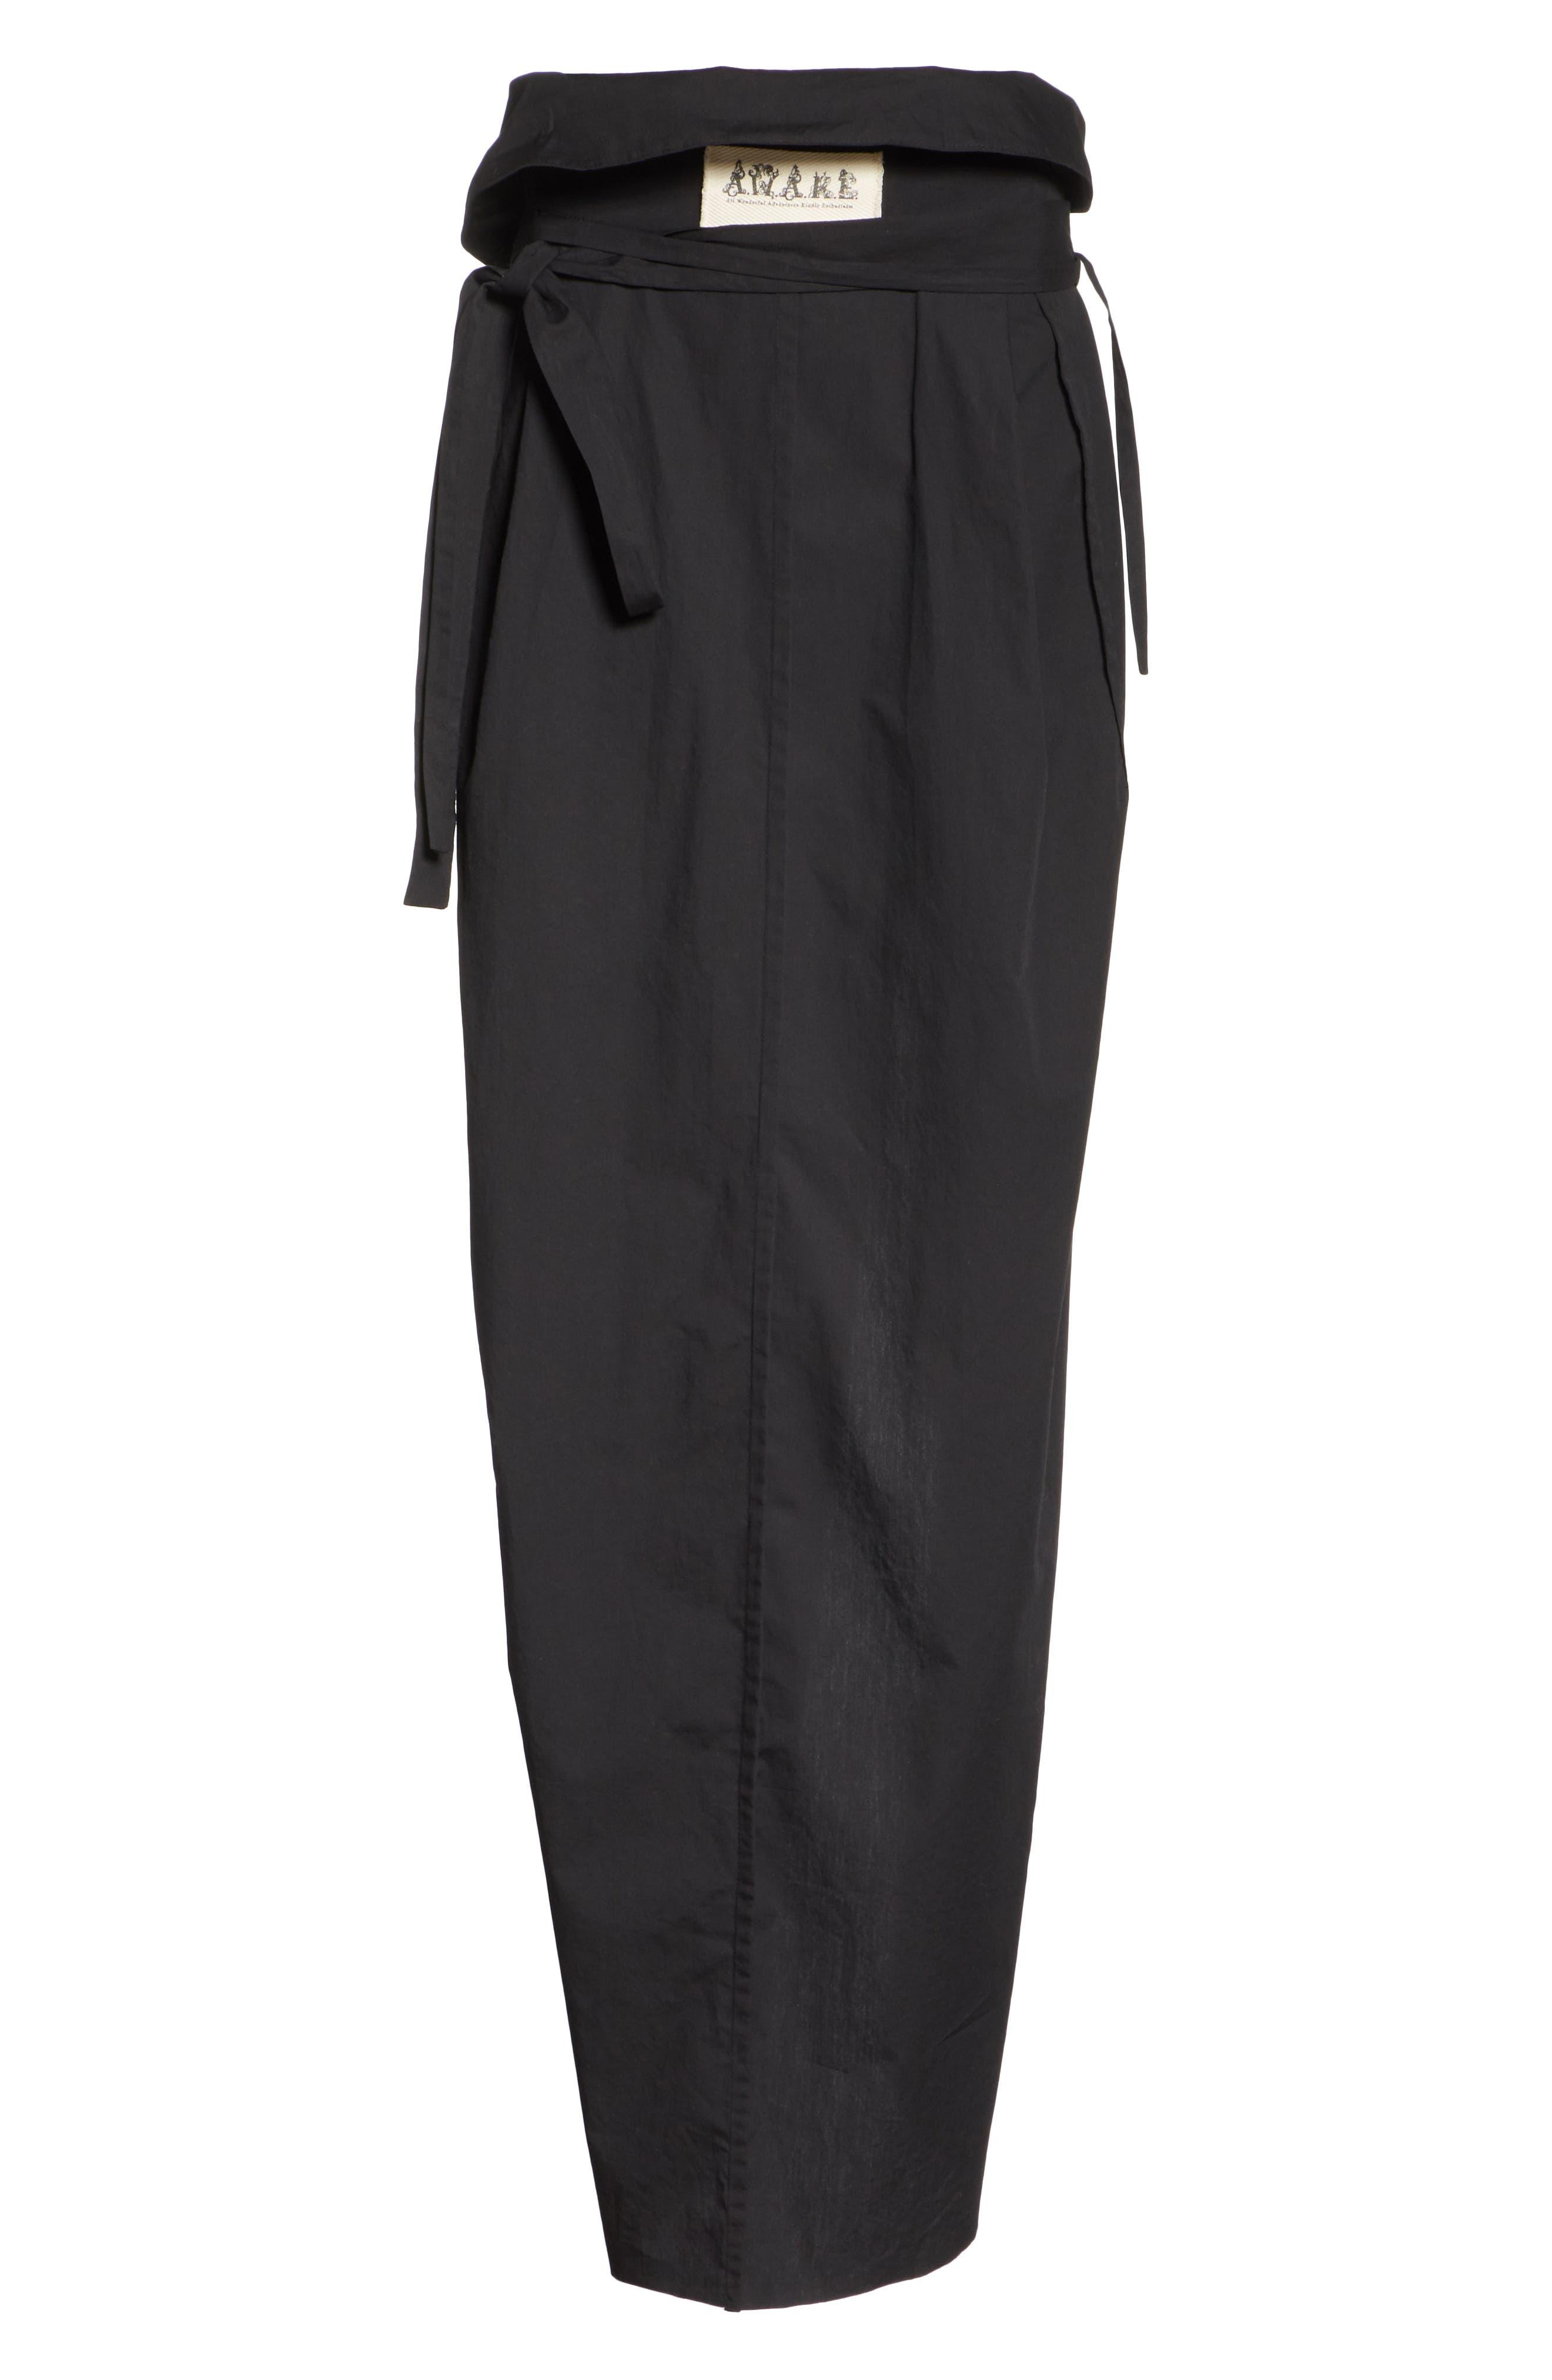 High Waist Wrap Skirt,                             Alternate thumbnail 6, color,                             001